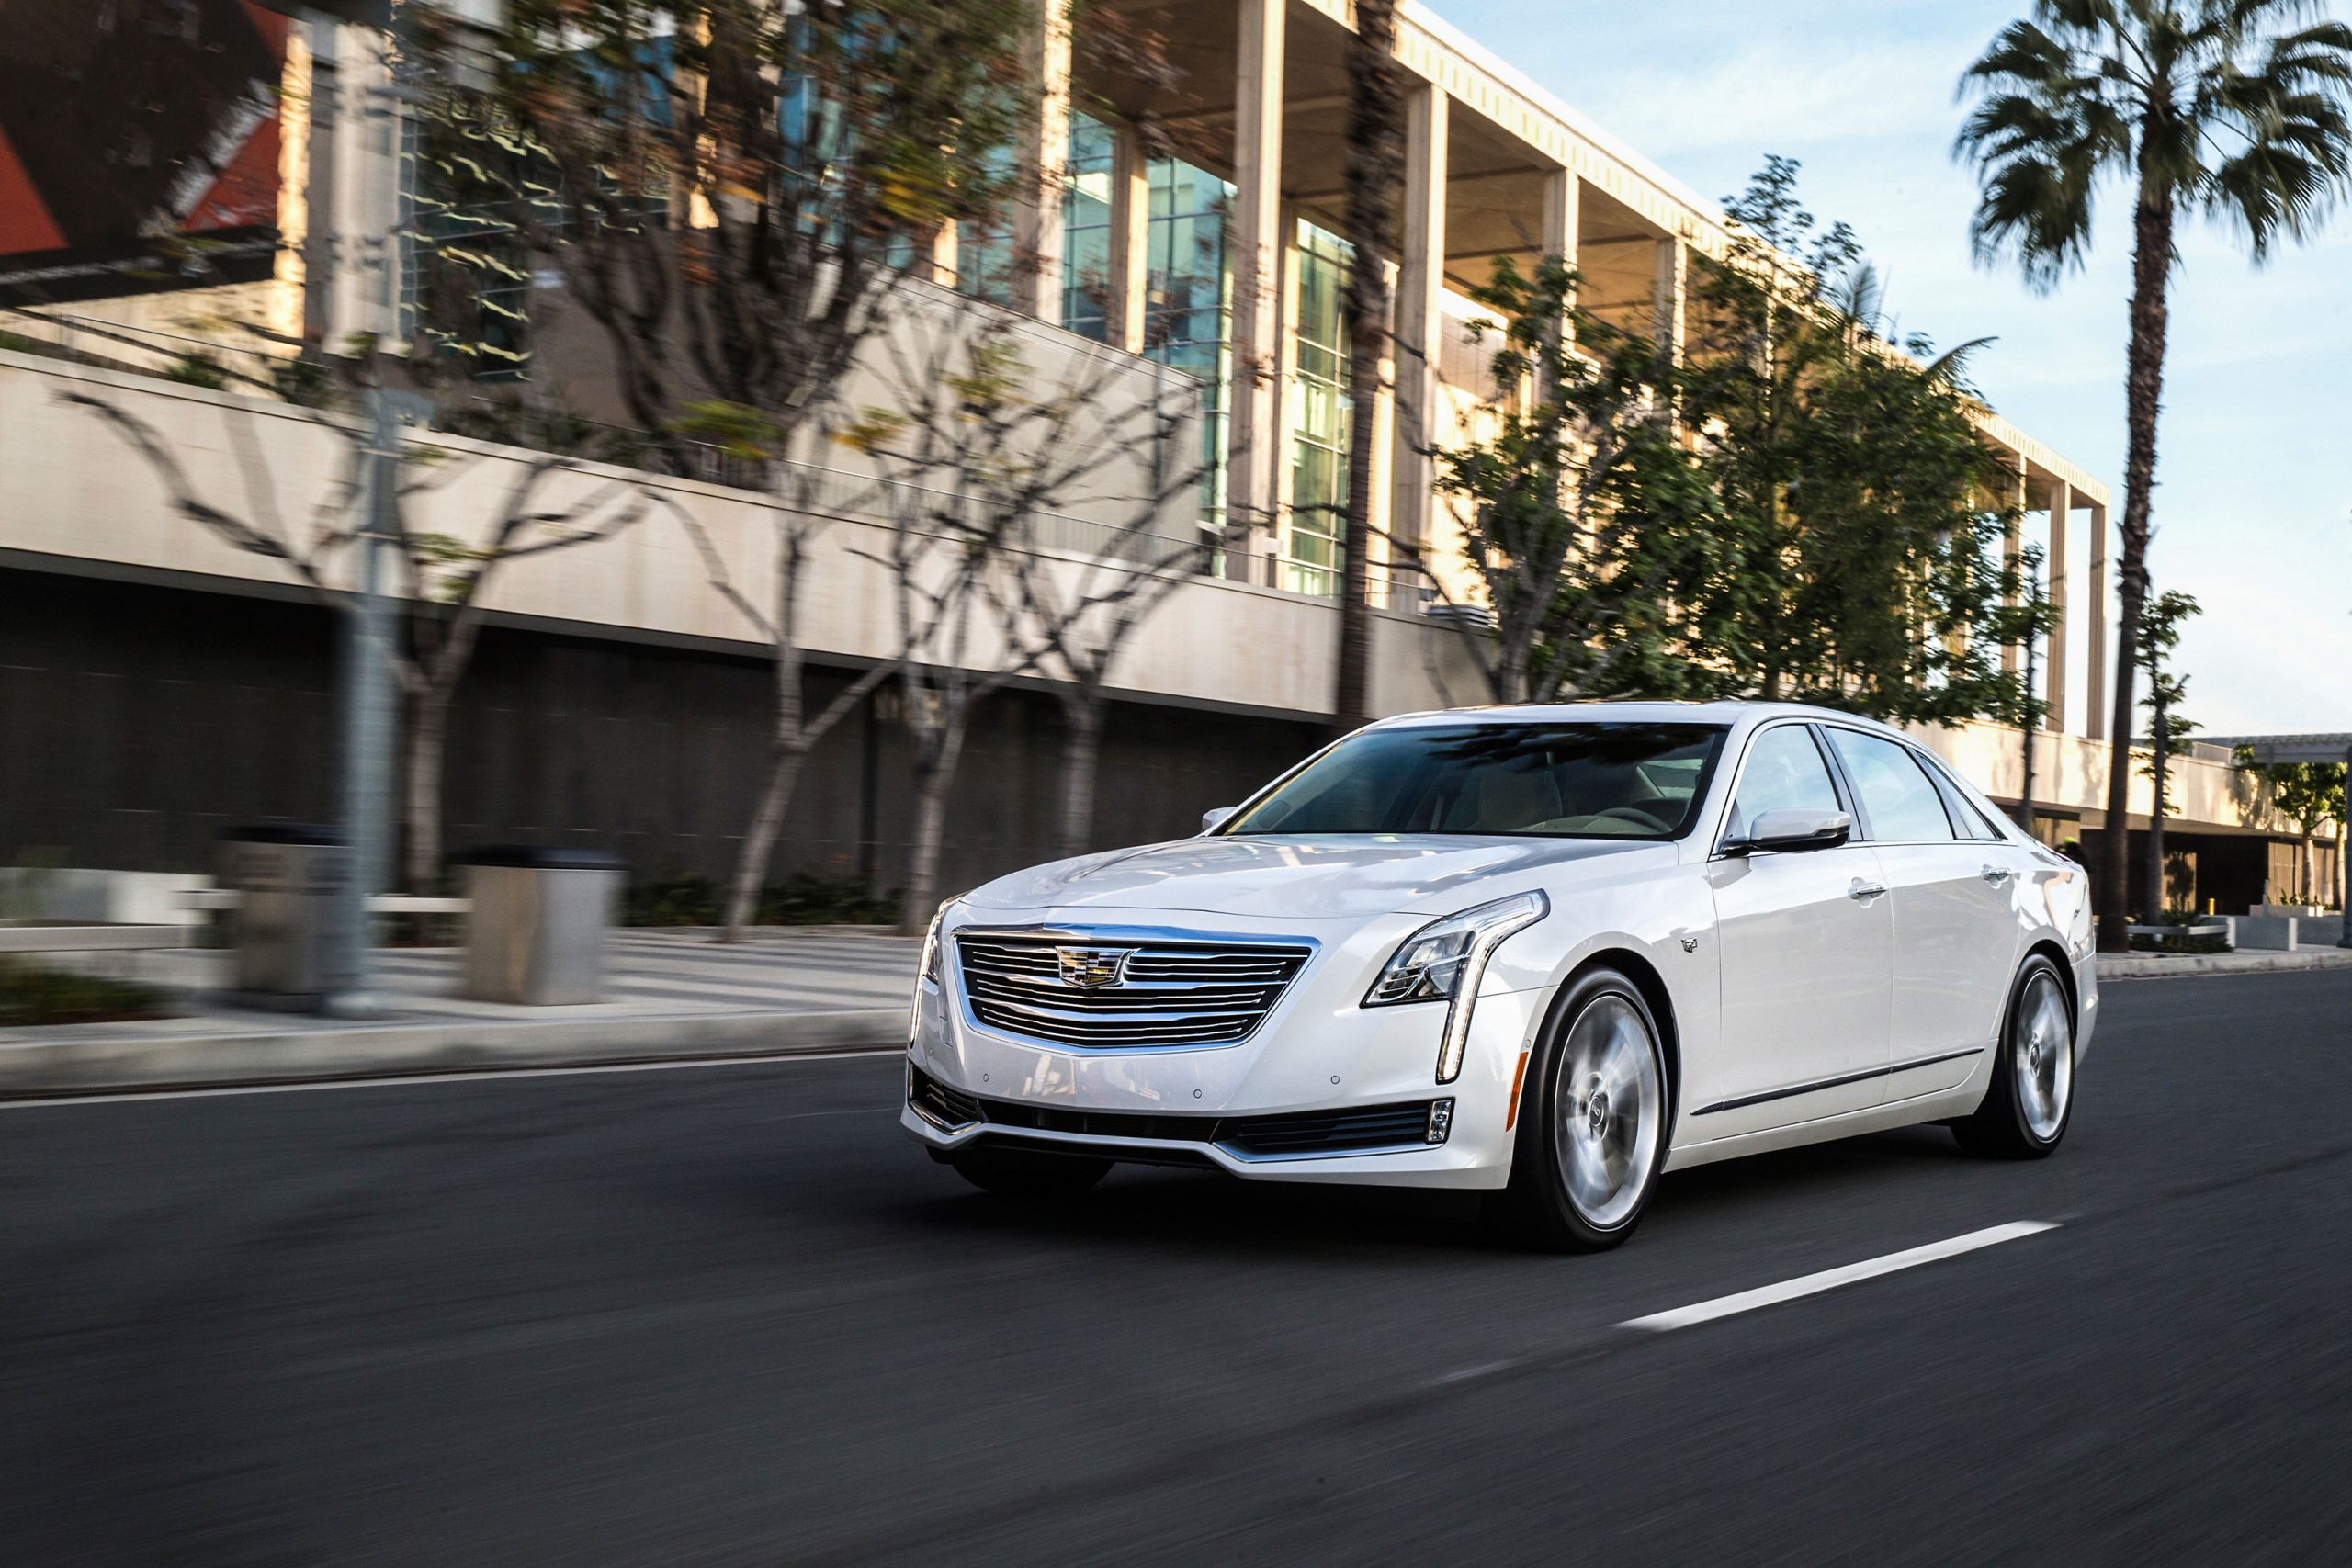 Ložiska nábojů kol pro nový Cadillac CT6